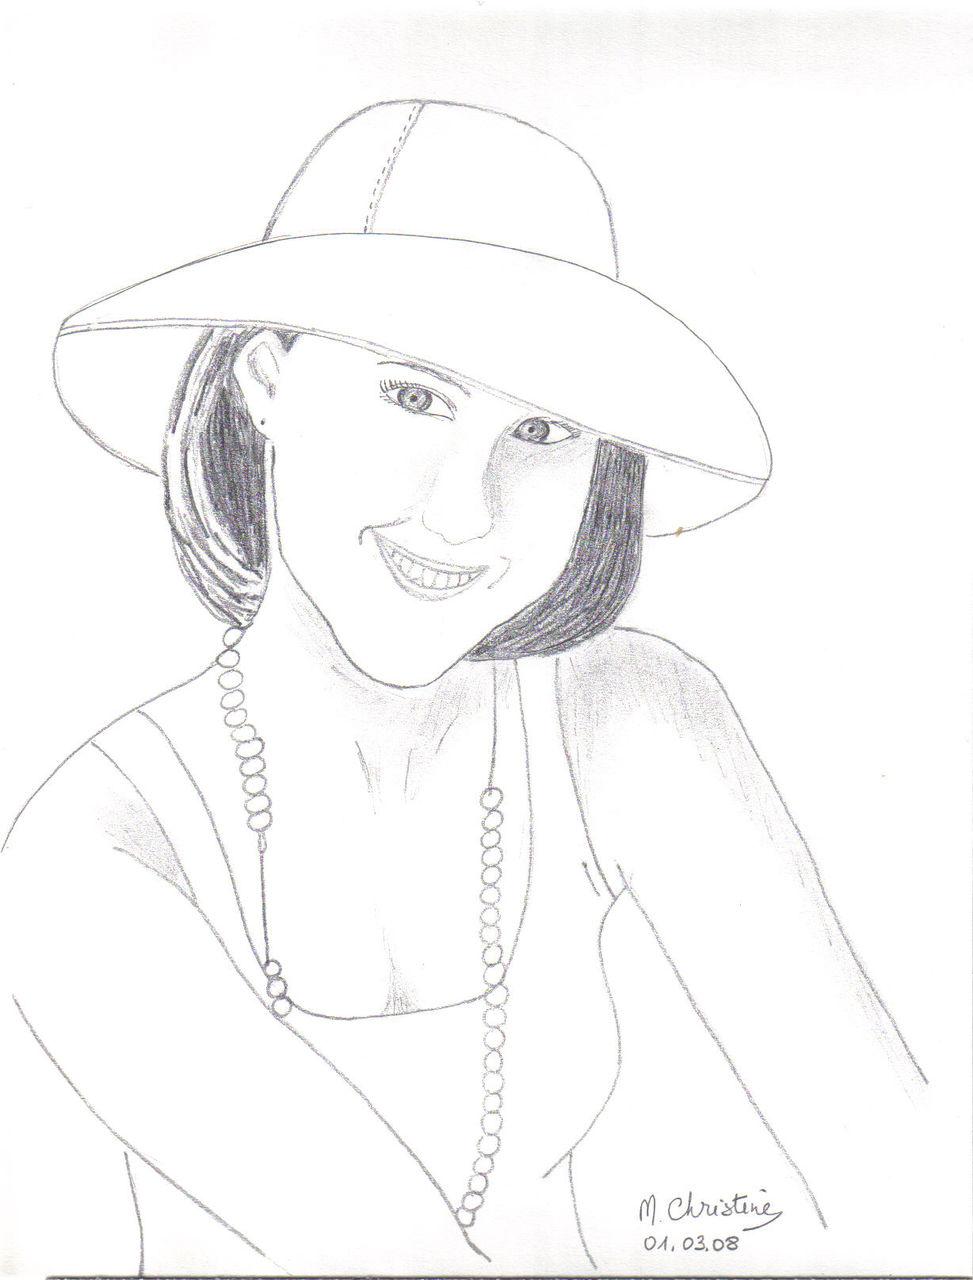 Schmucker Marie-Christine La dame au chapeau